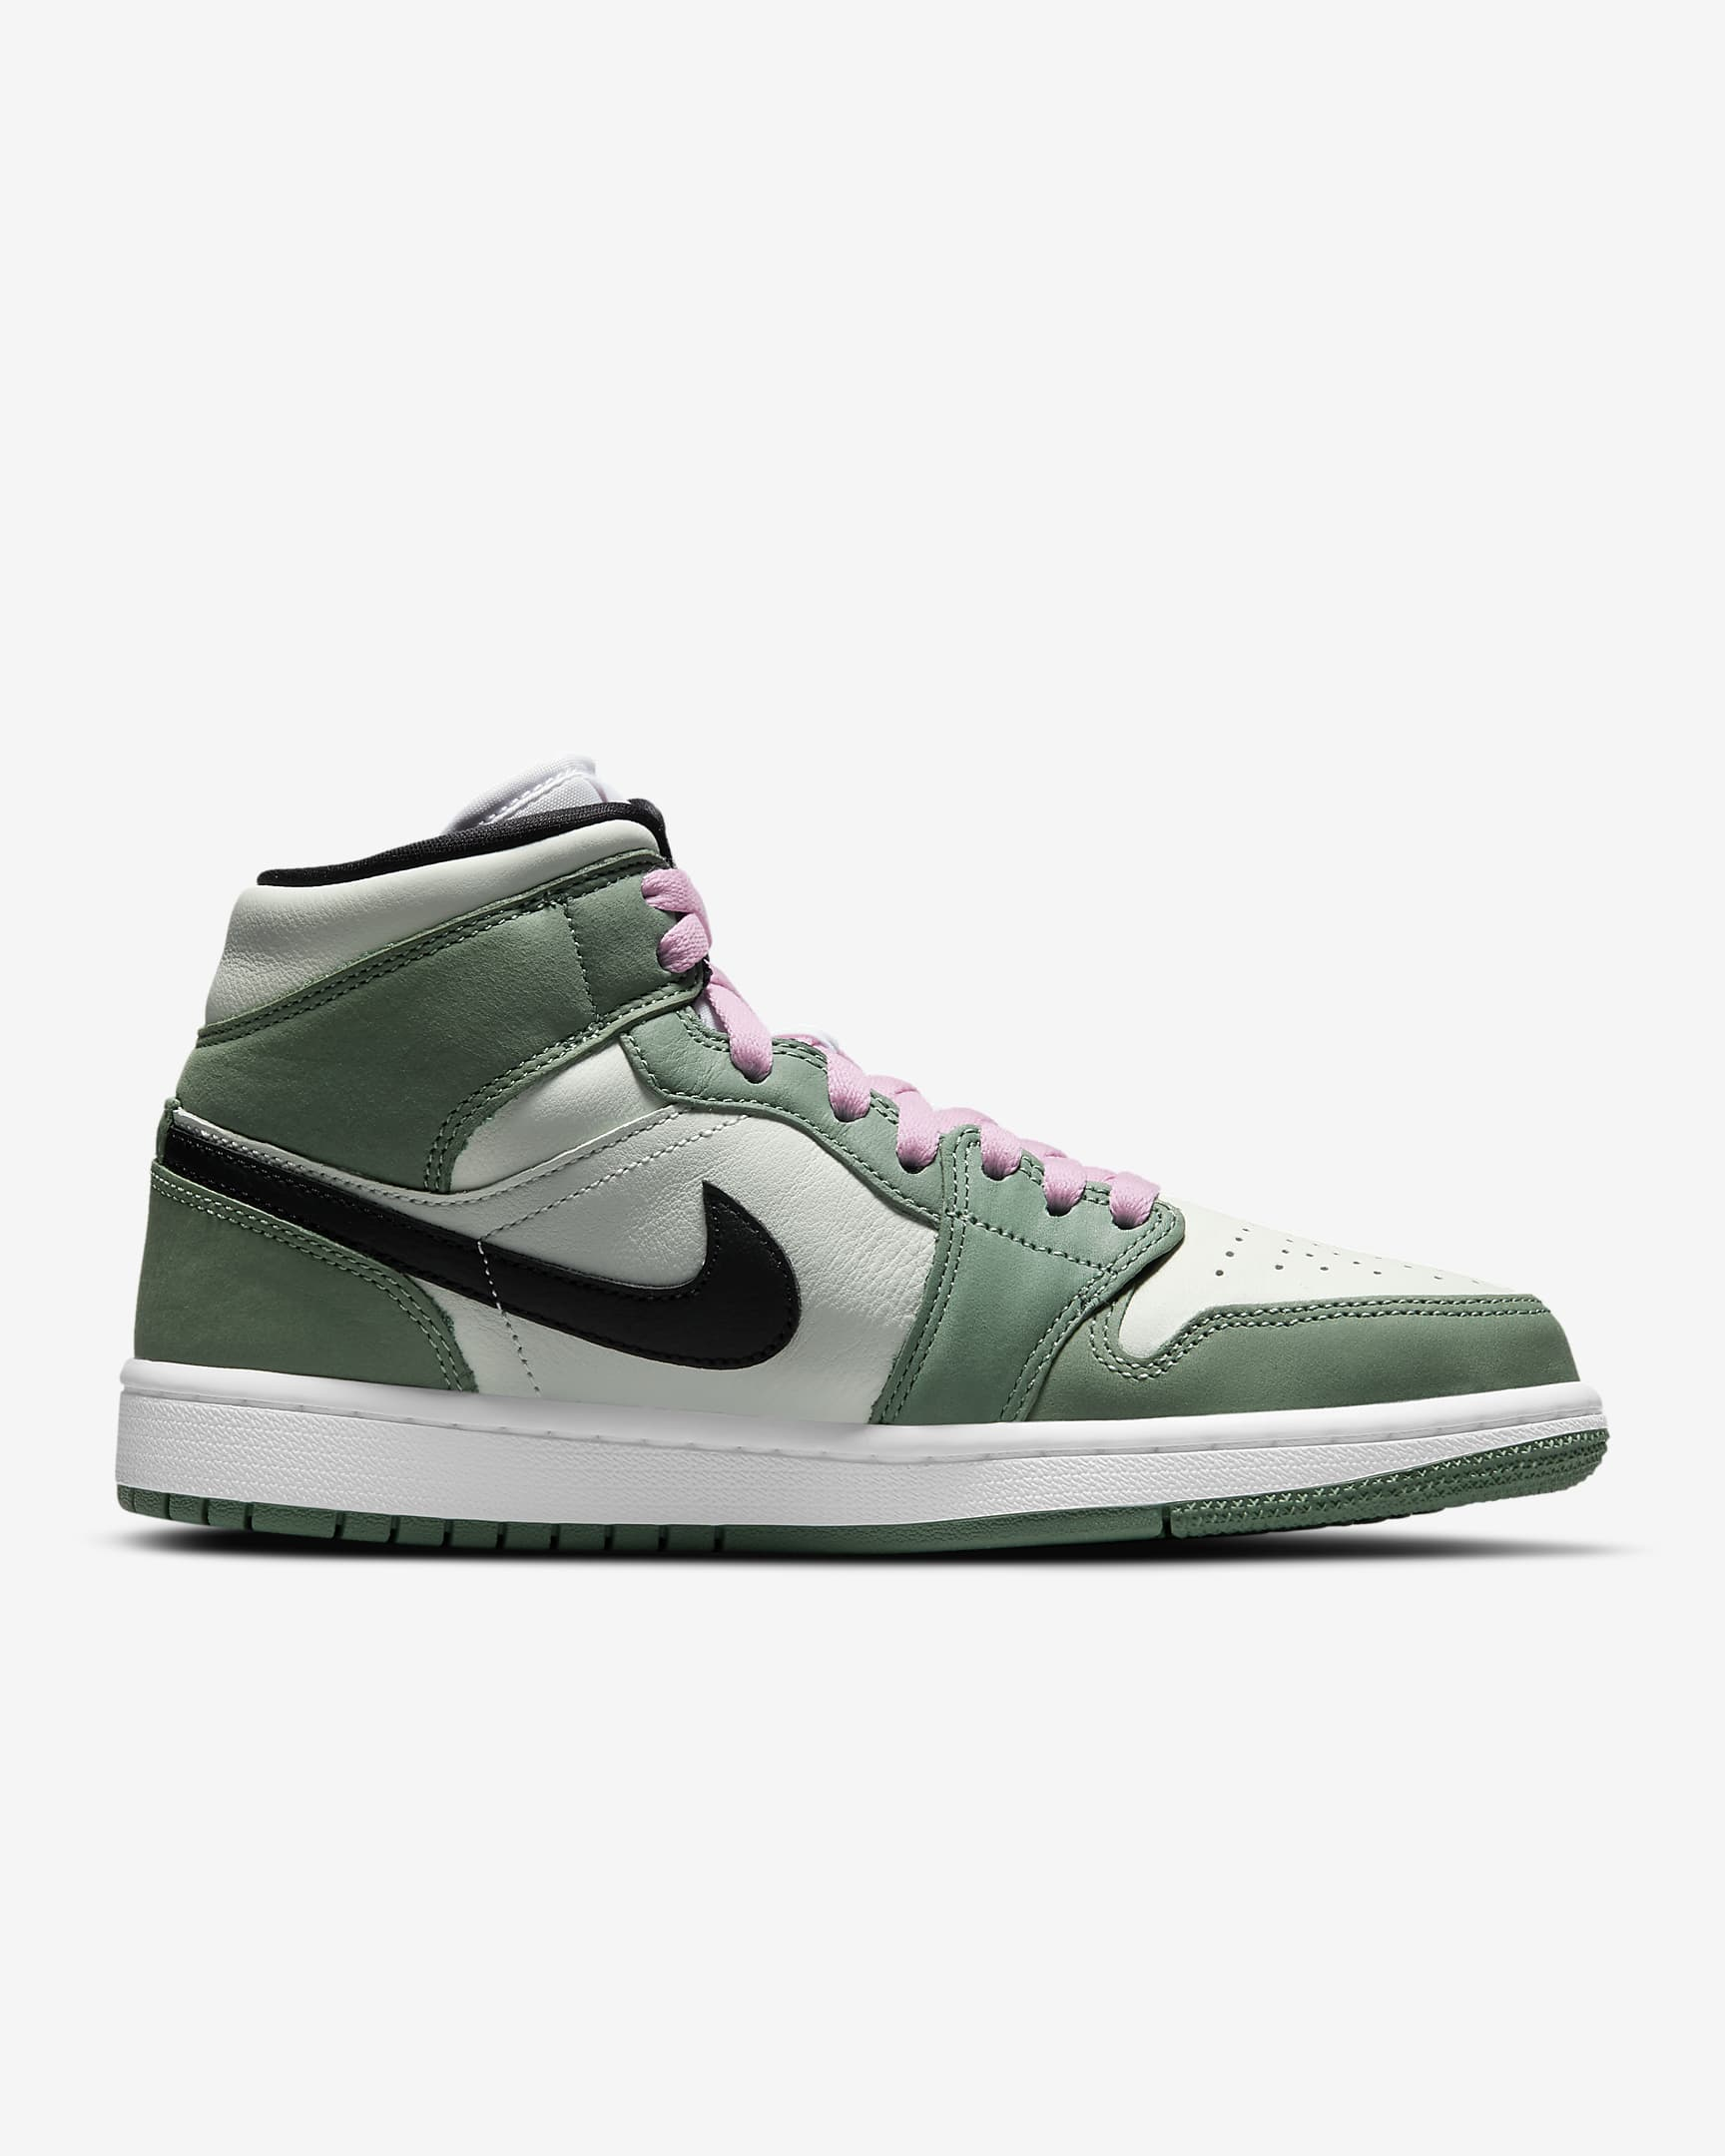 Air Jordan 1 Dutch Green Arctic Pinkv